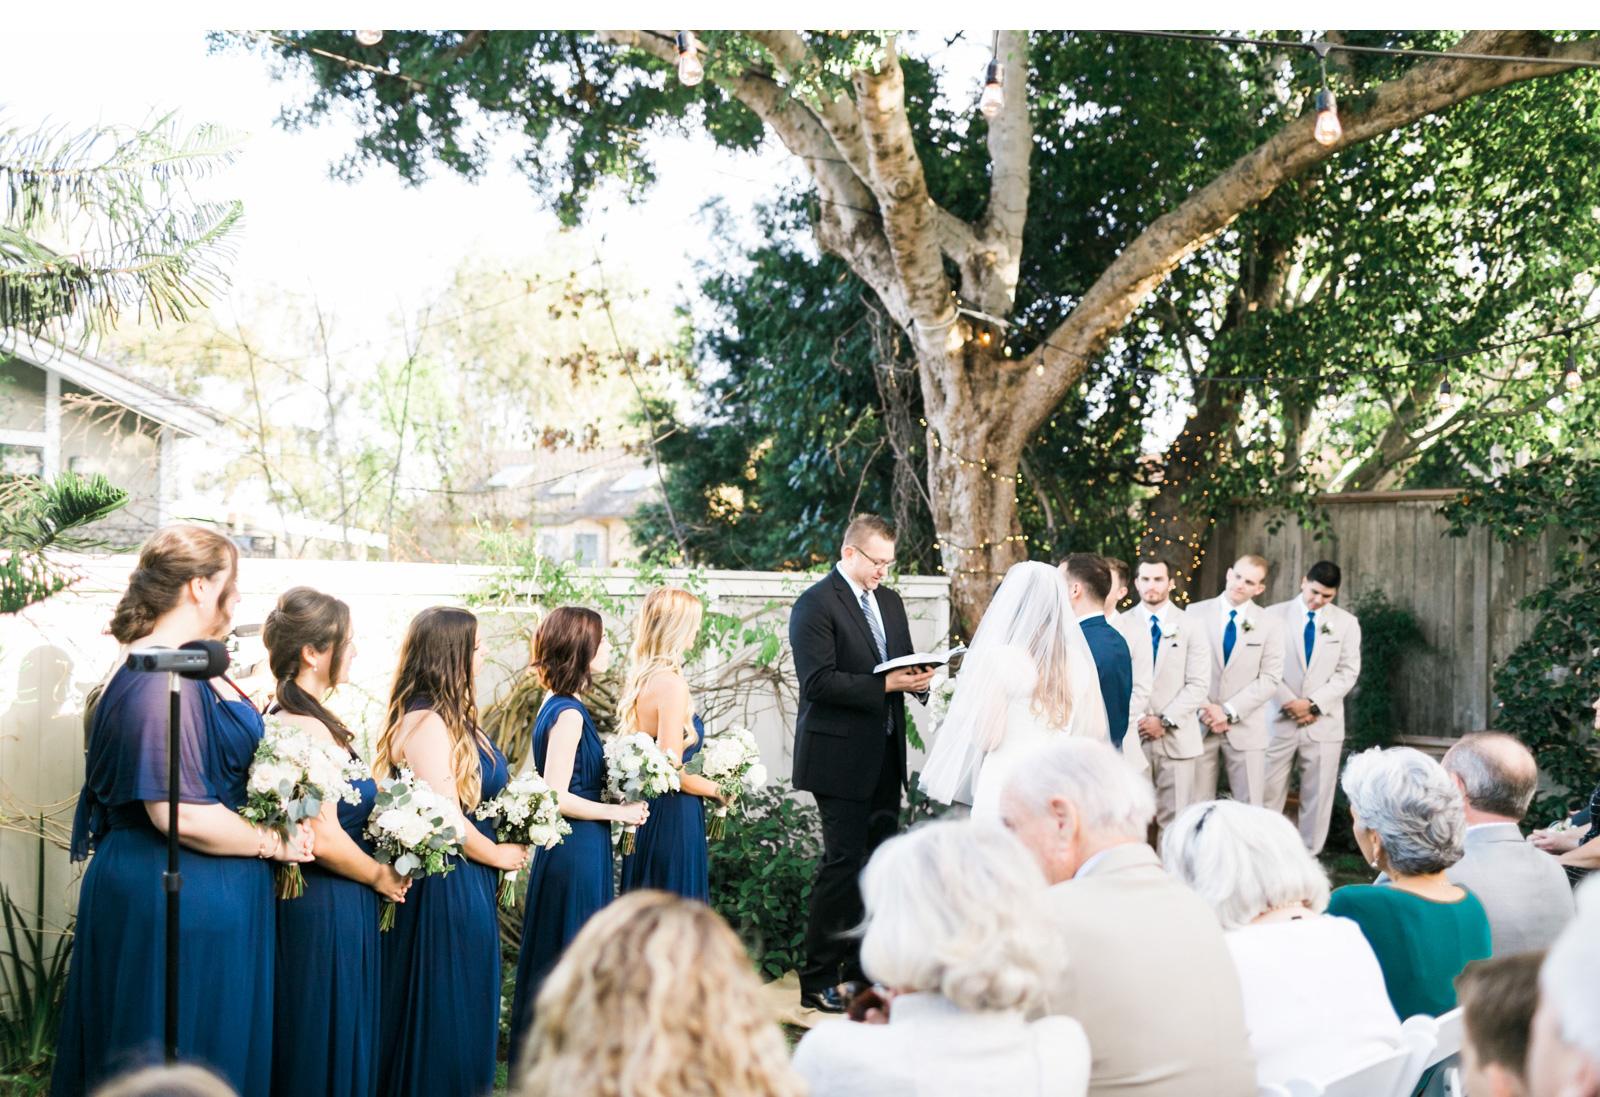 Jon-&-Amanda-Dougher's-Backyard-Wedding-Natalie-Schutt-Photography_08.jpg